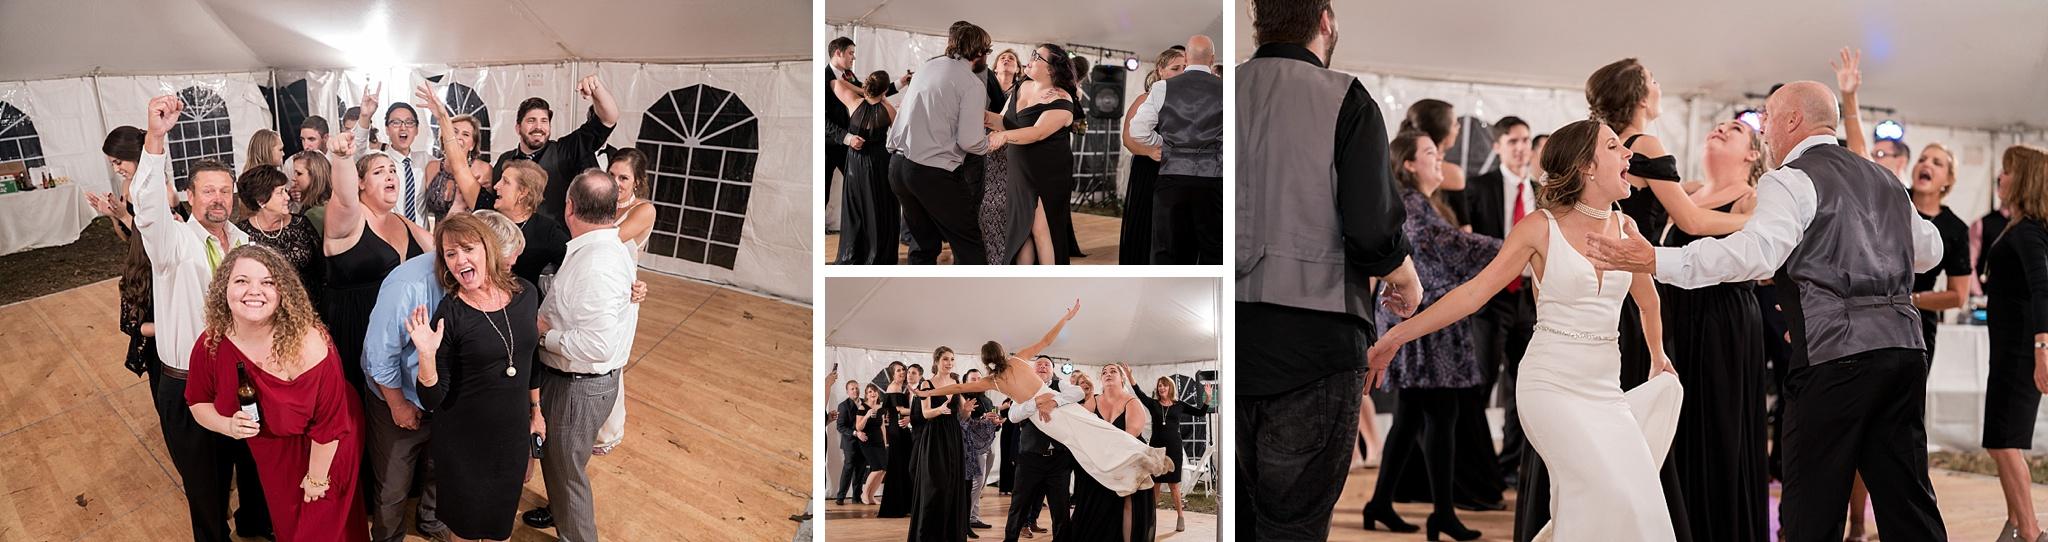 Grantham-House-Wedding-Photogrpaher-051.jpg